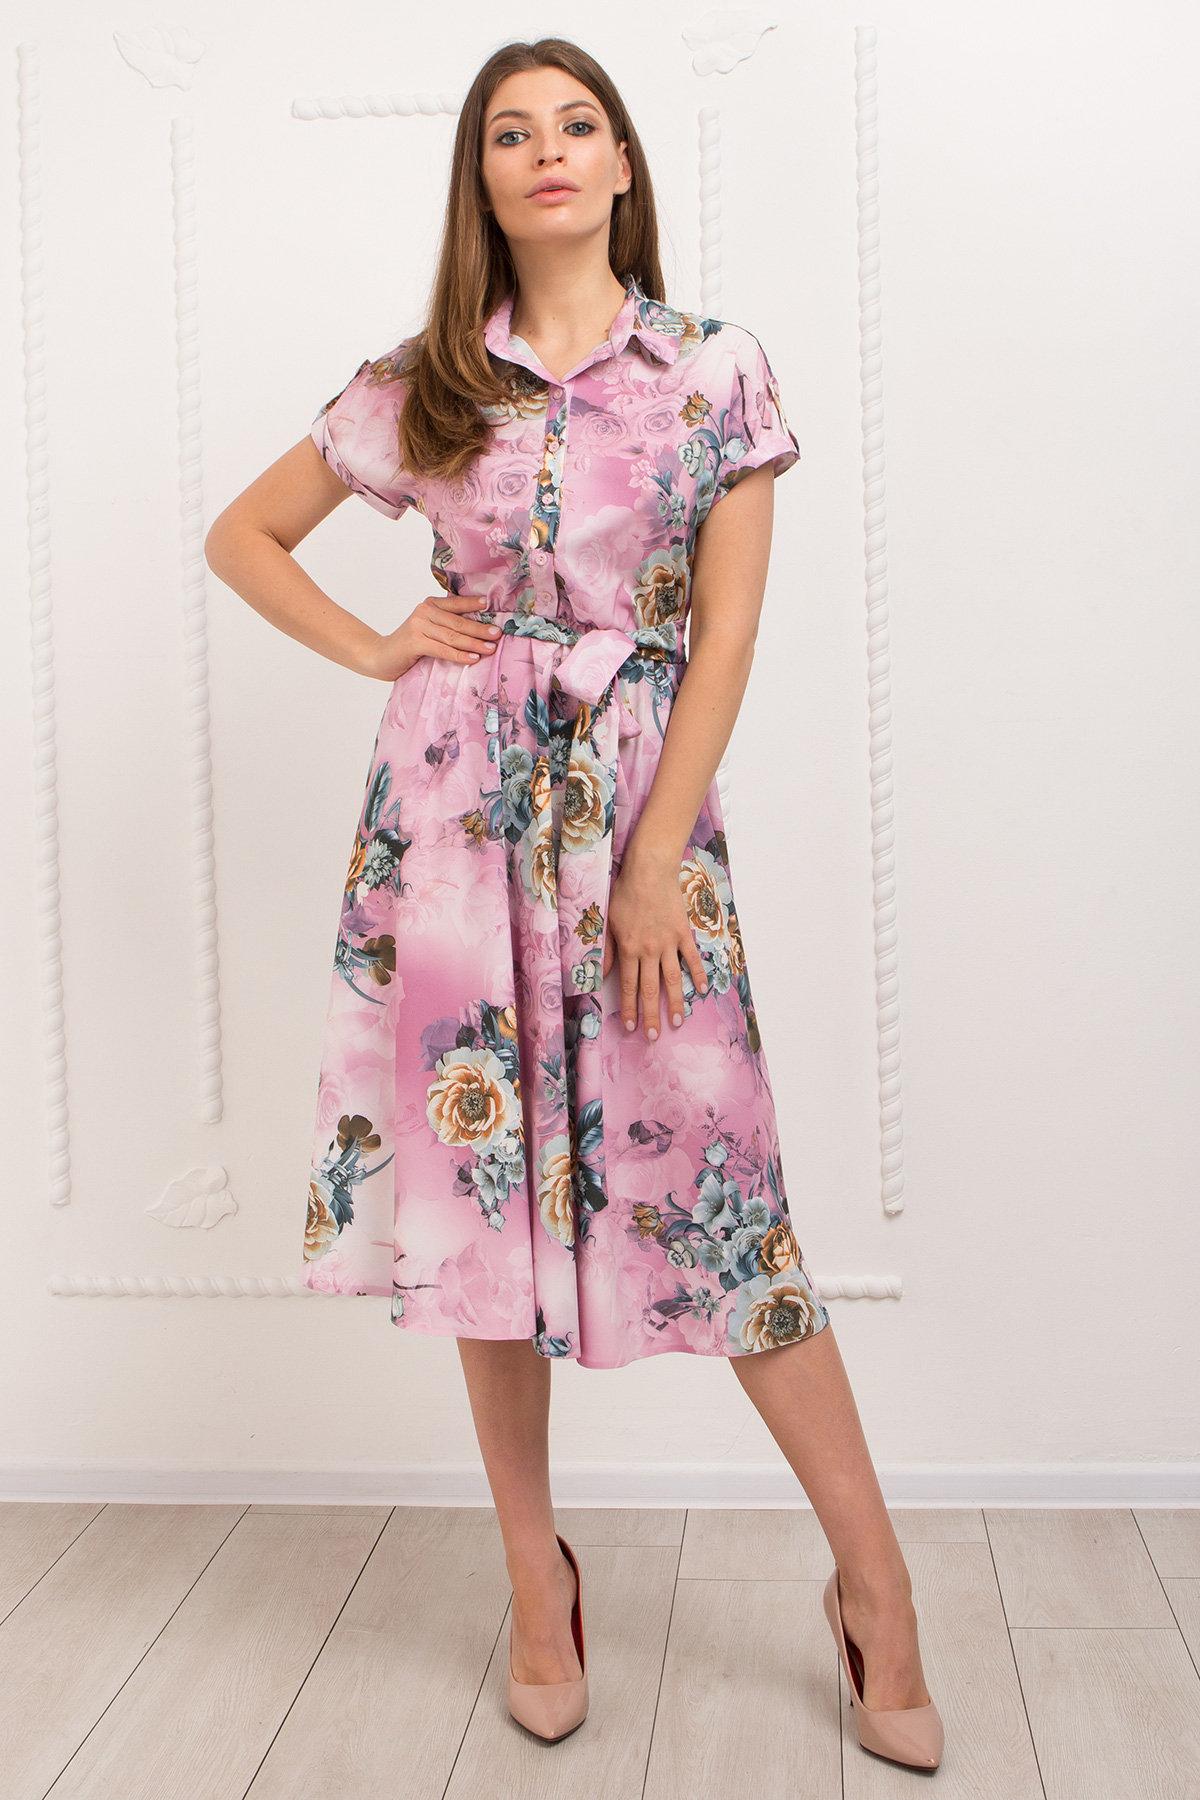 Платье Санжар 9090 АРТ. 45412 Цвет: цветы комби роз/мол/охра - фото 2, интернет магазин tm-modus.ru